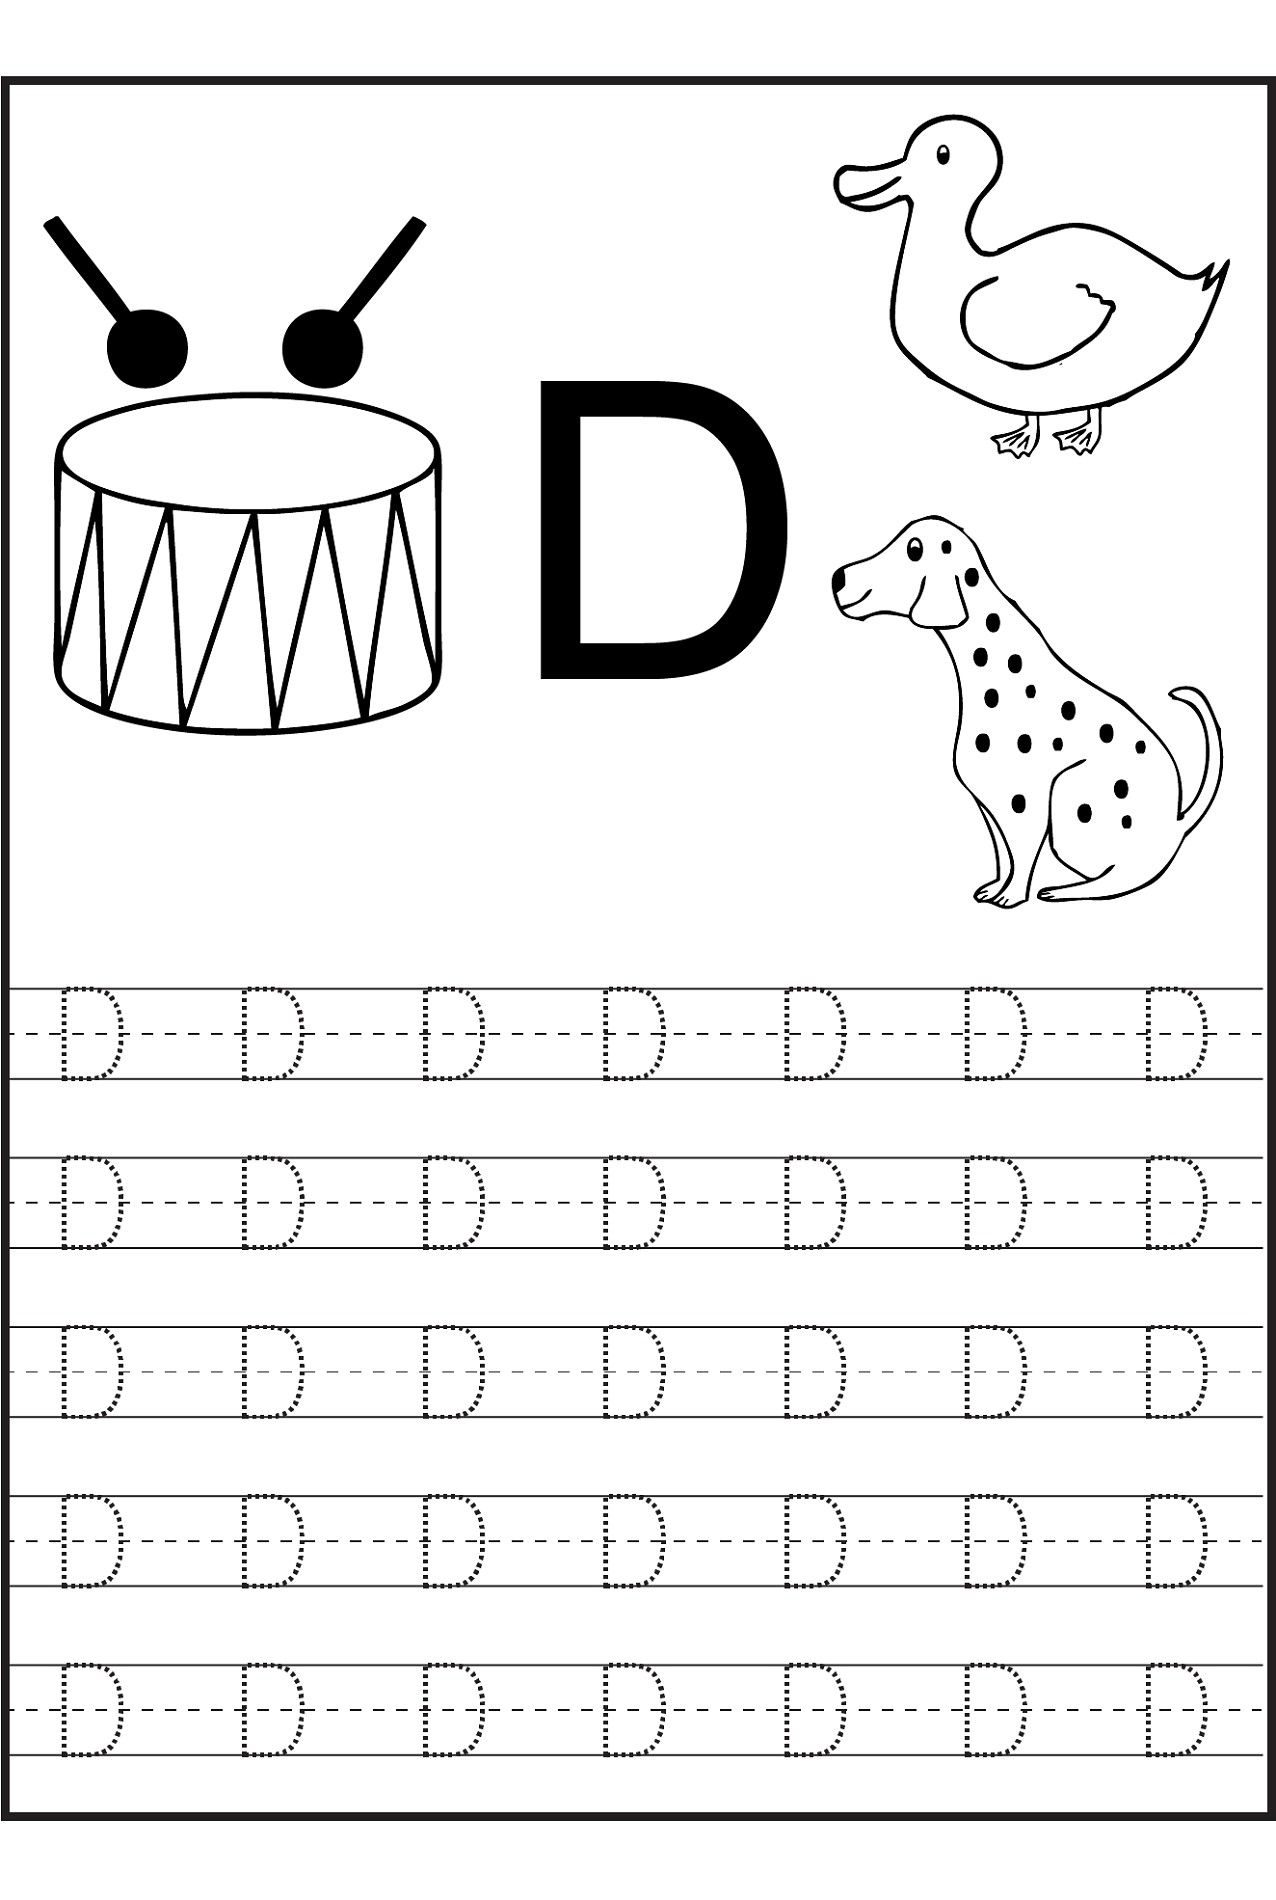 4 Worksheet Alphabet Worksheet For Nursery Class With